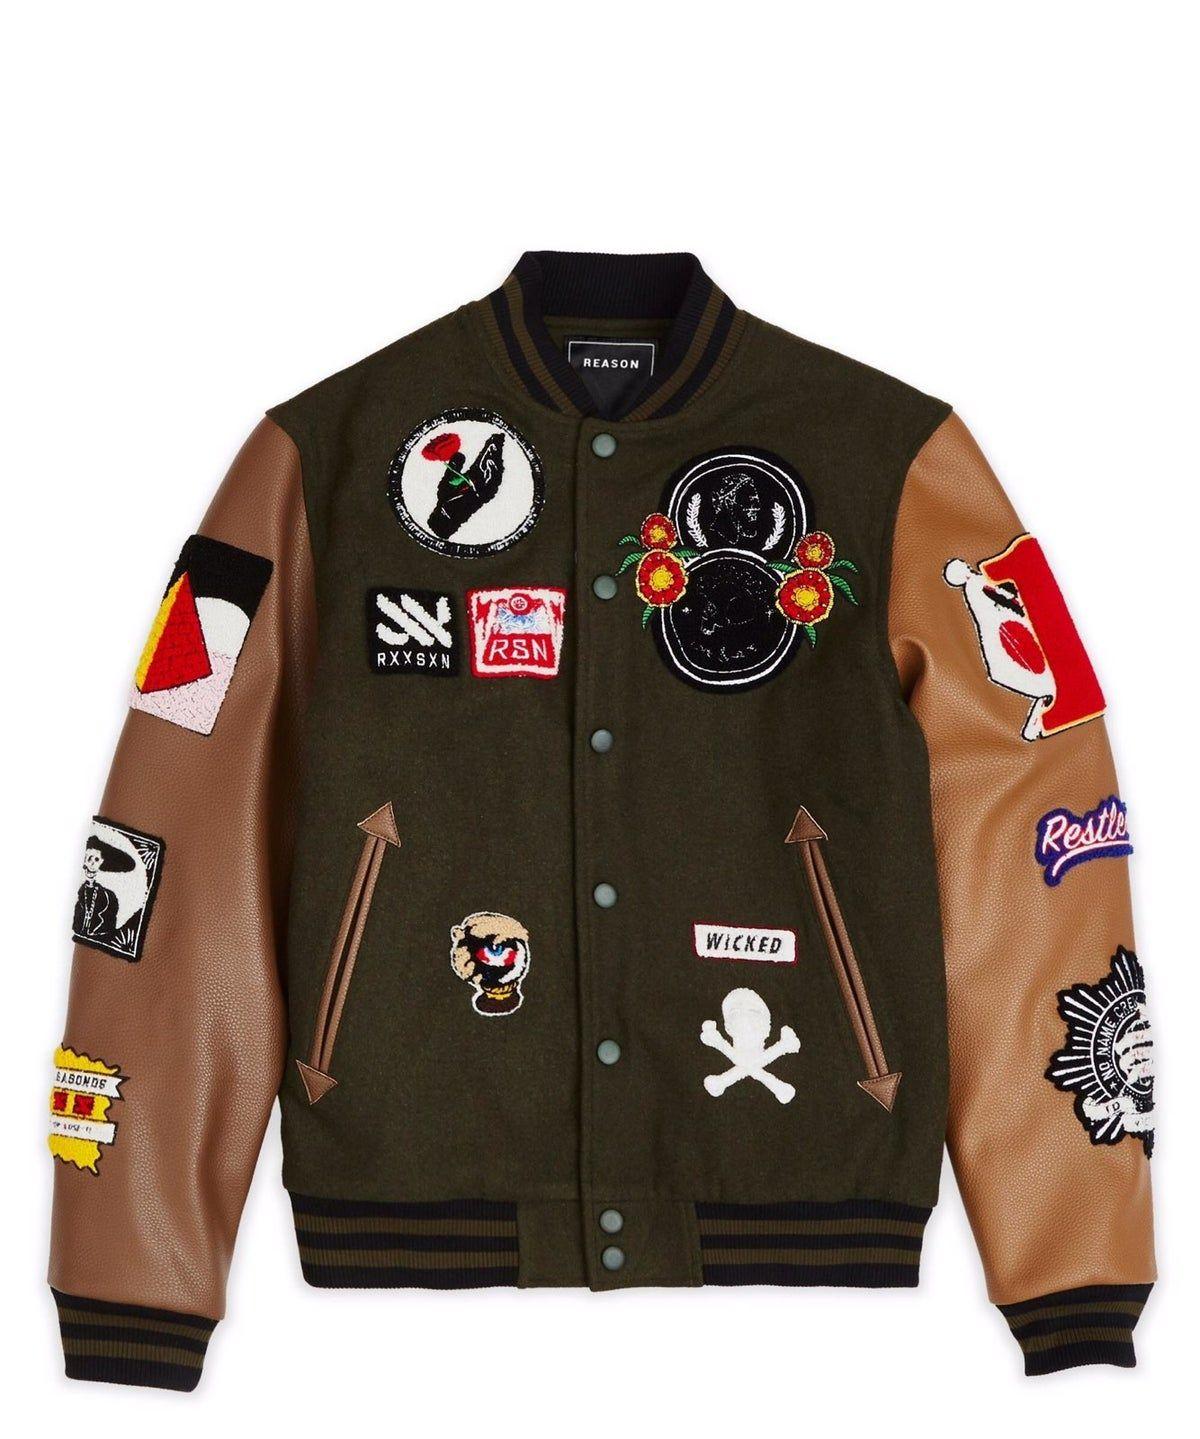 mens panter varsity jacket olive sz 3x #varsityjacketoutfit